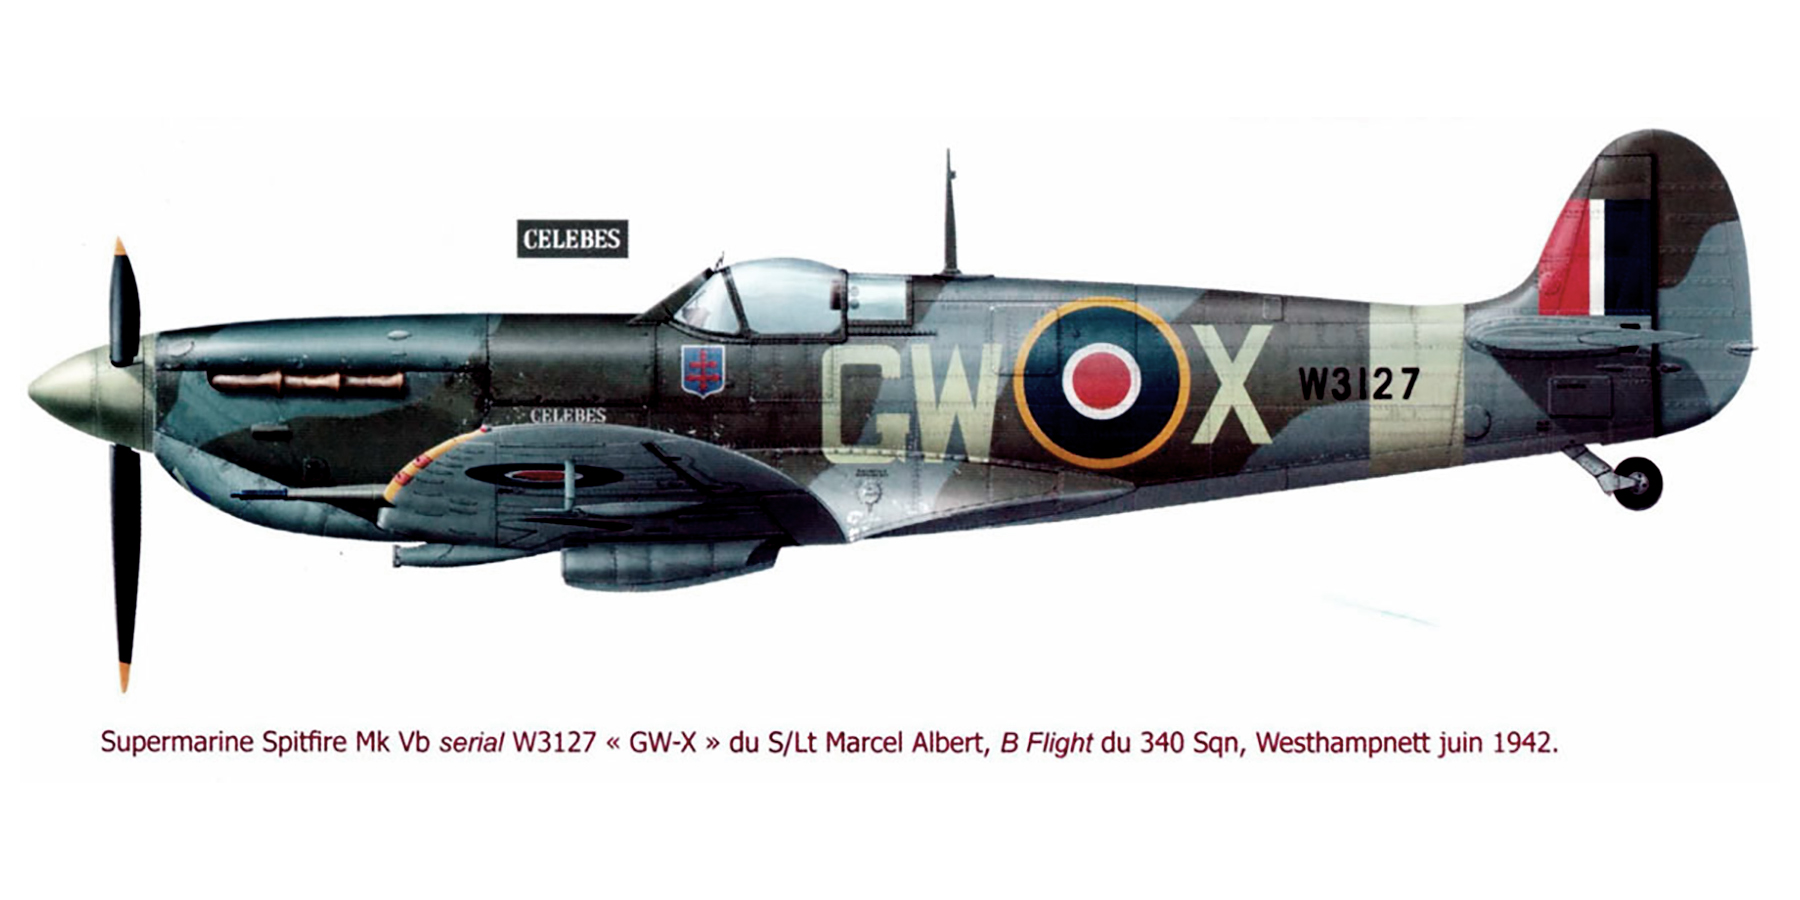 Spitfire MkVb RAF 340Sqn GWX Marcel Albert W3127 Westhampnett Chichester June 1942 0A